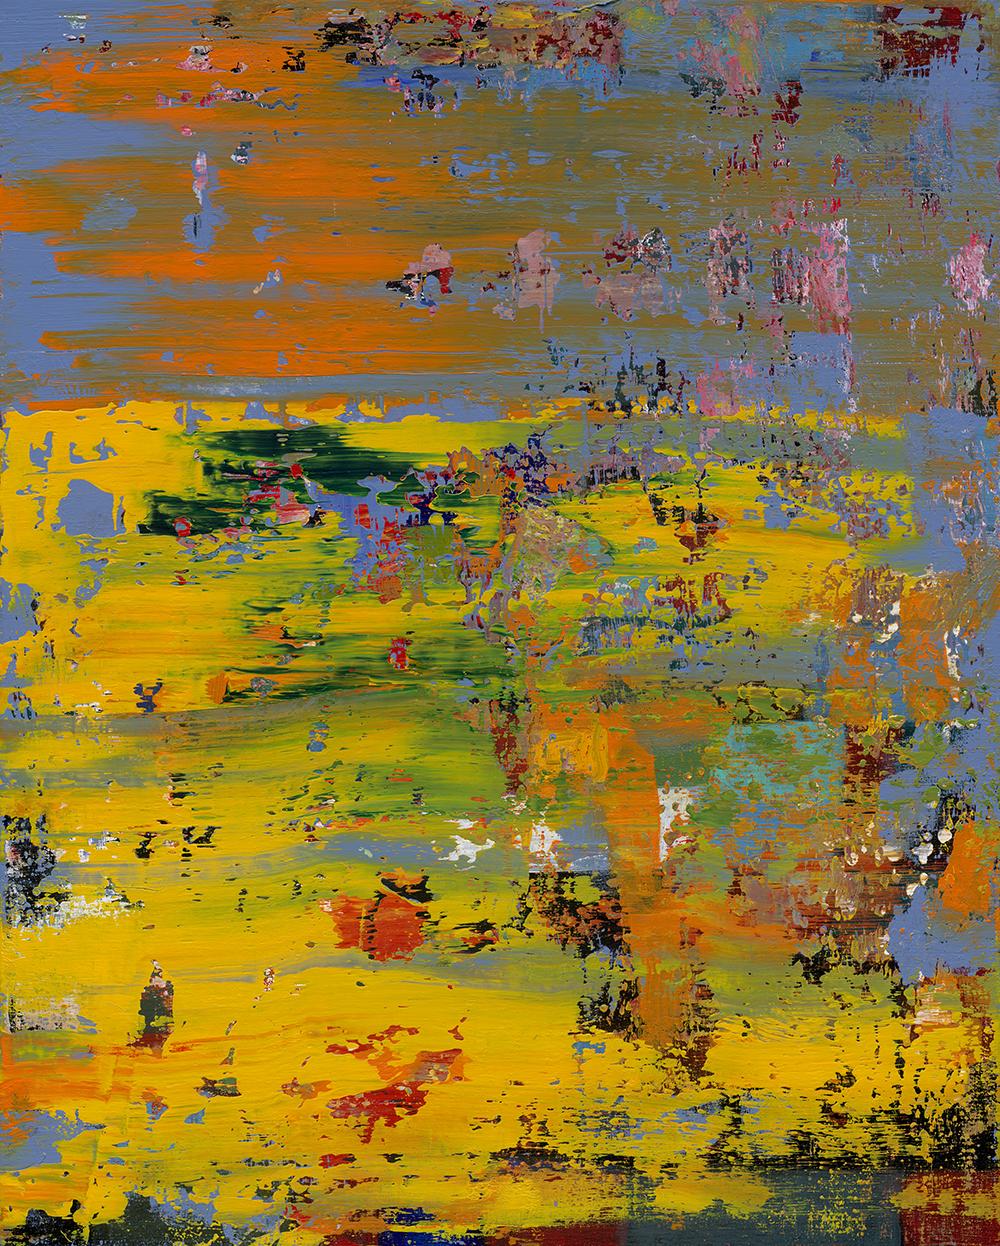 A Walk in Autumn, Robert Huang, Mixed media, 2017 (100x80cm)